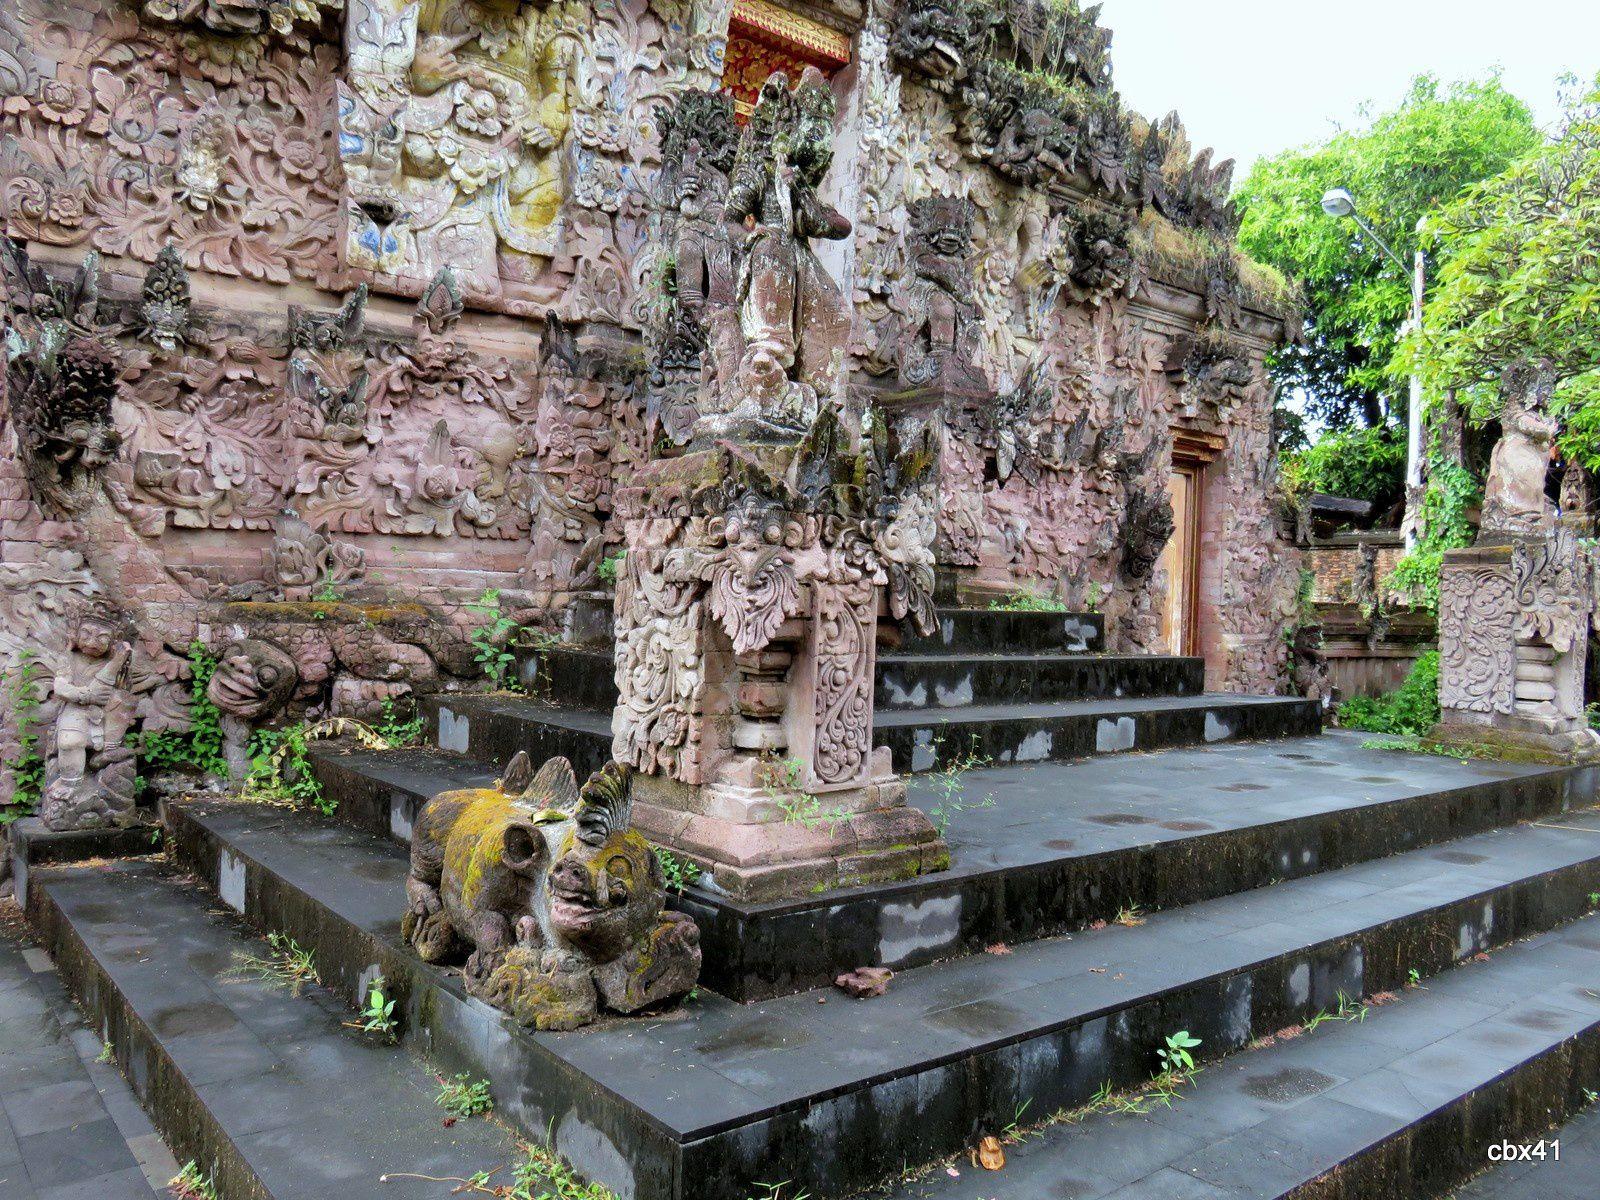 Le temple Pura Beji, la première porte (Bali, Indonésie)